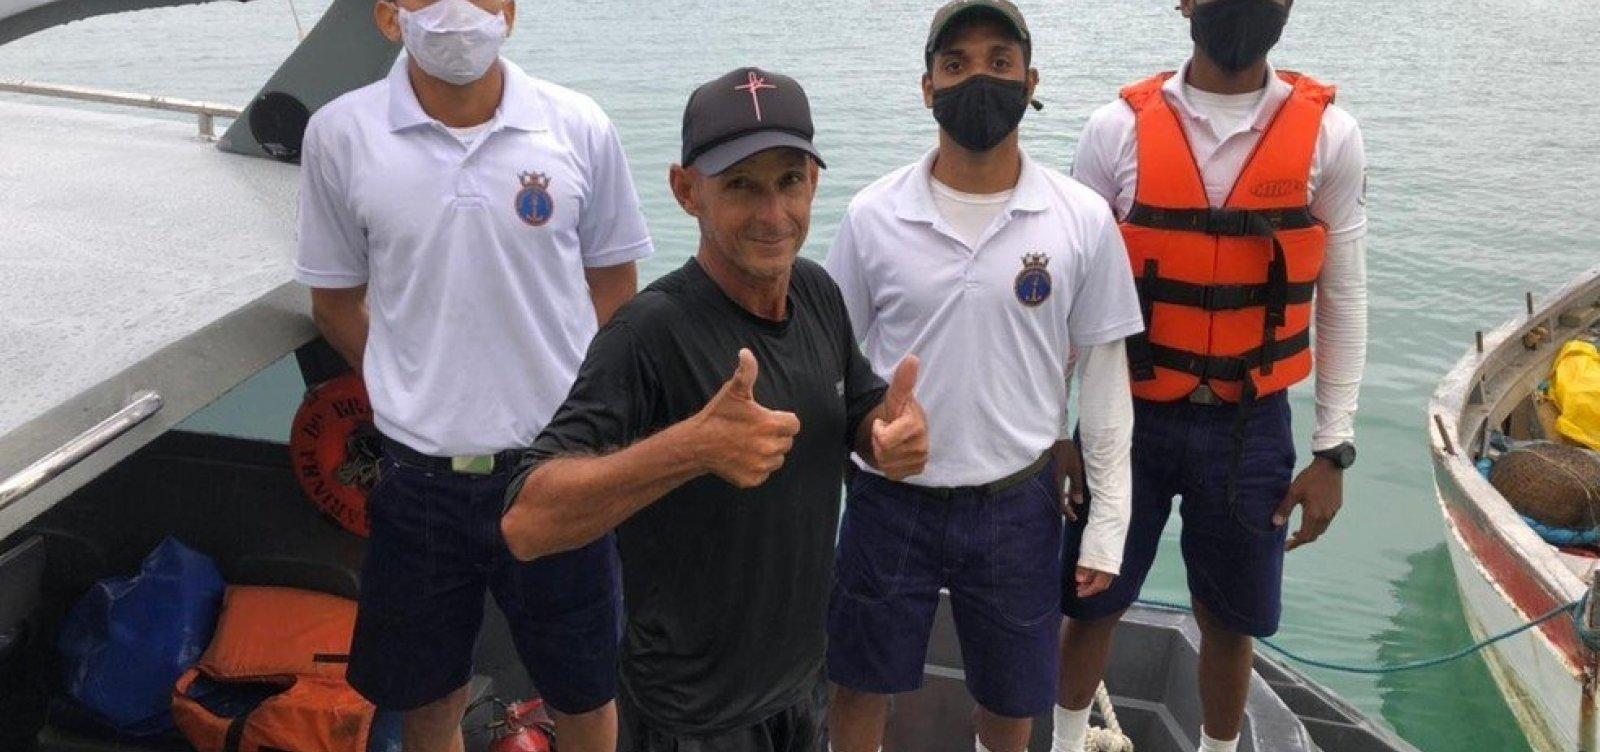 Pescador é encontrado após 24 horas à deriva na baía de Todos-os-Santos